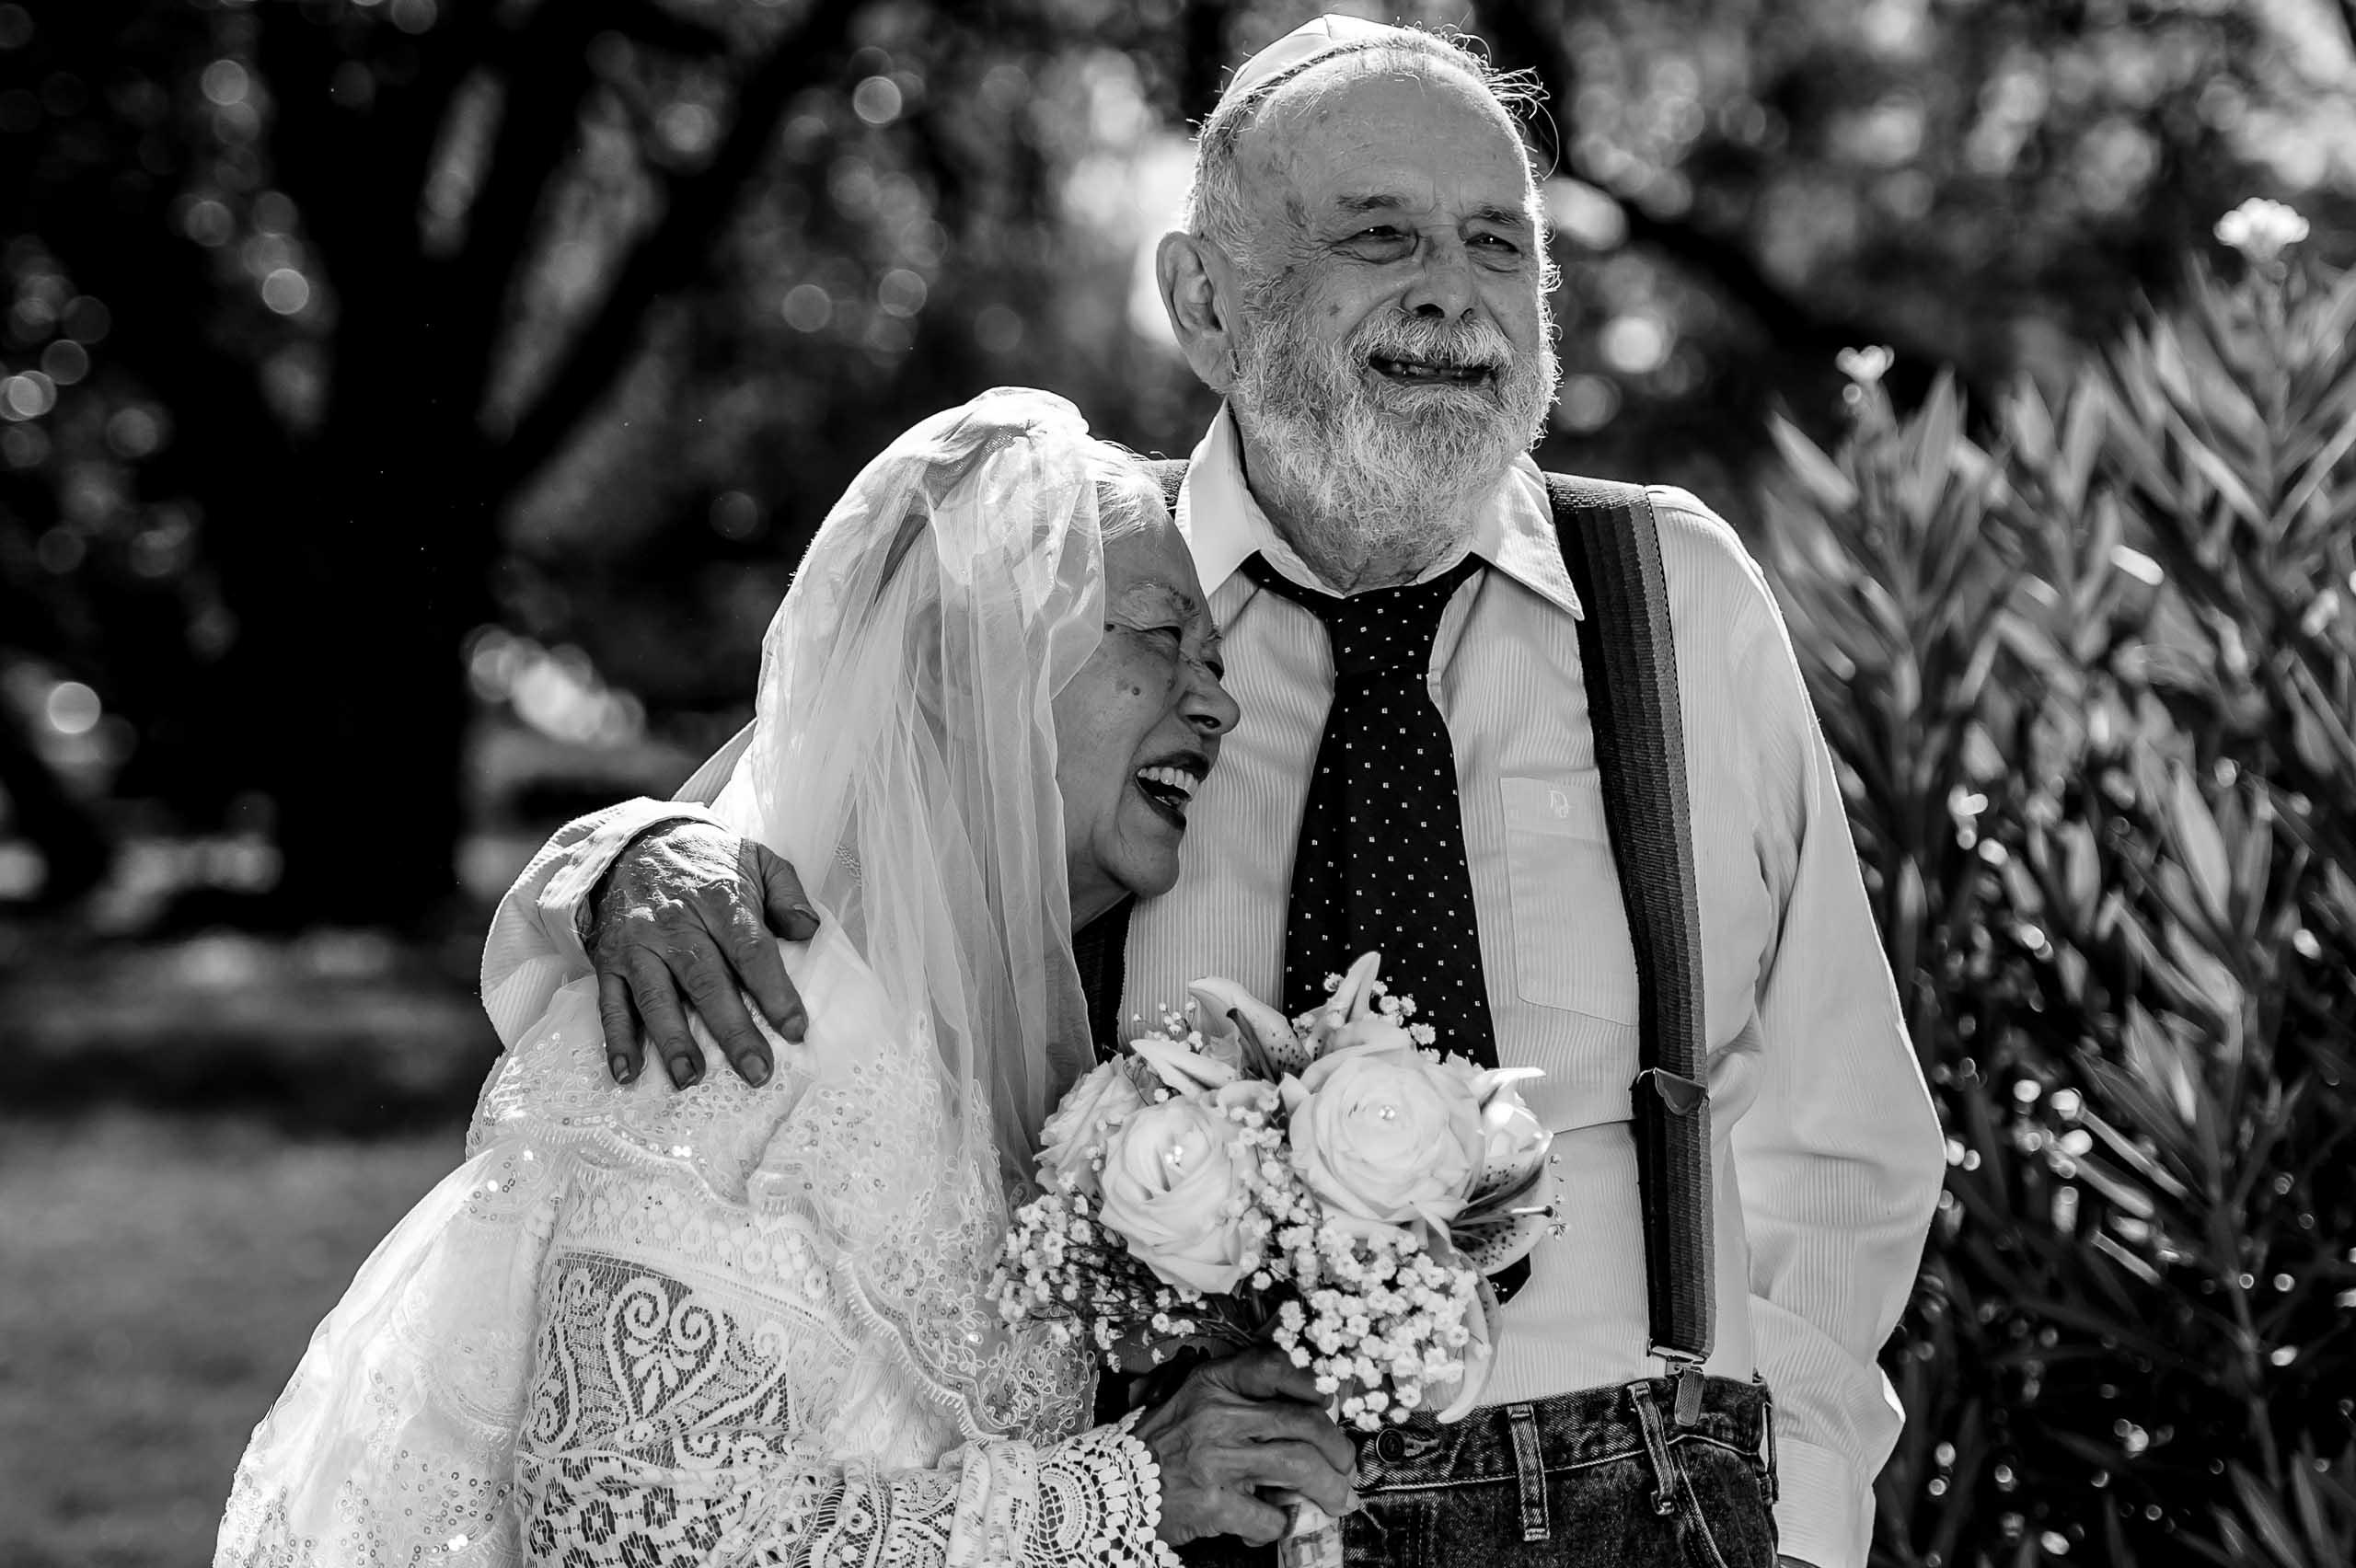 san-antonio-wedding-photographers-atagirl-4S1_0099-Edit